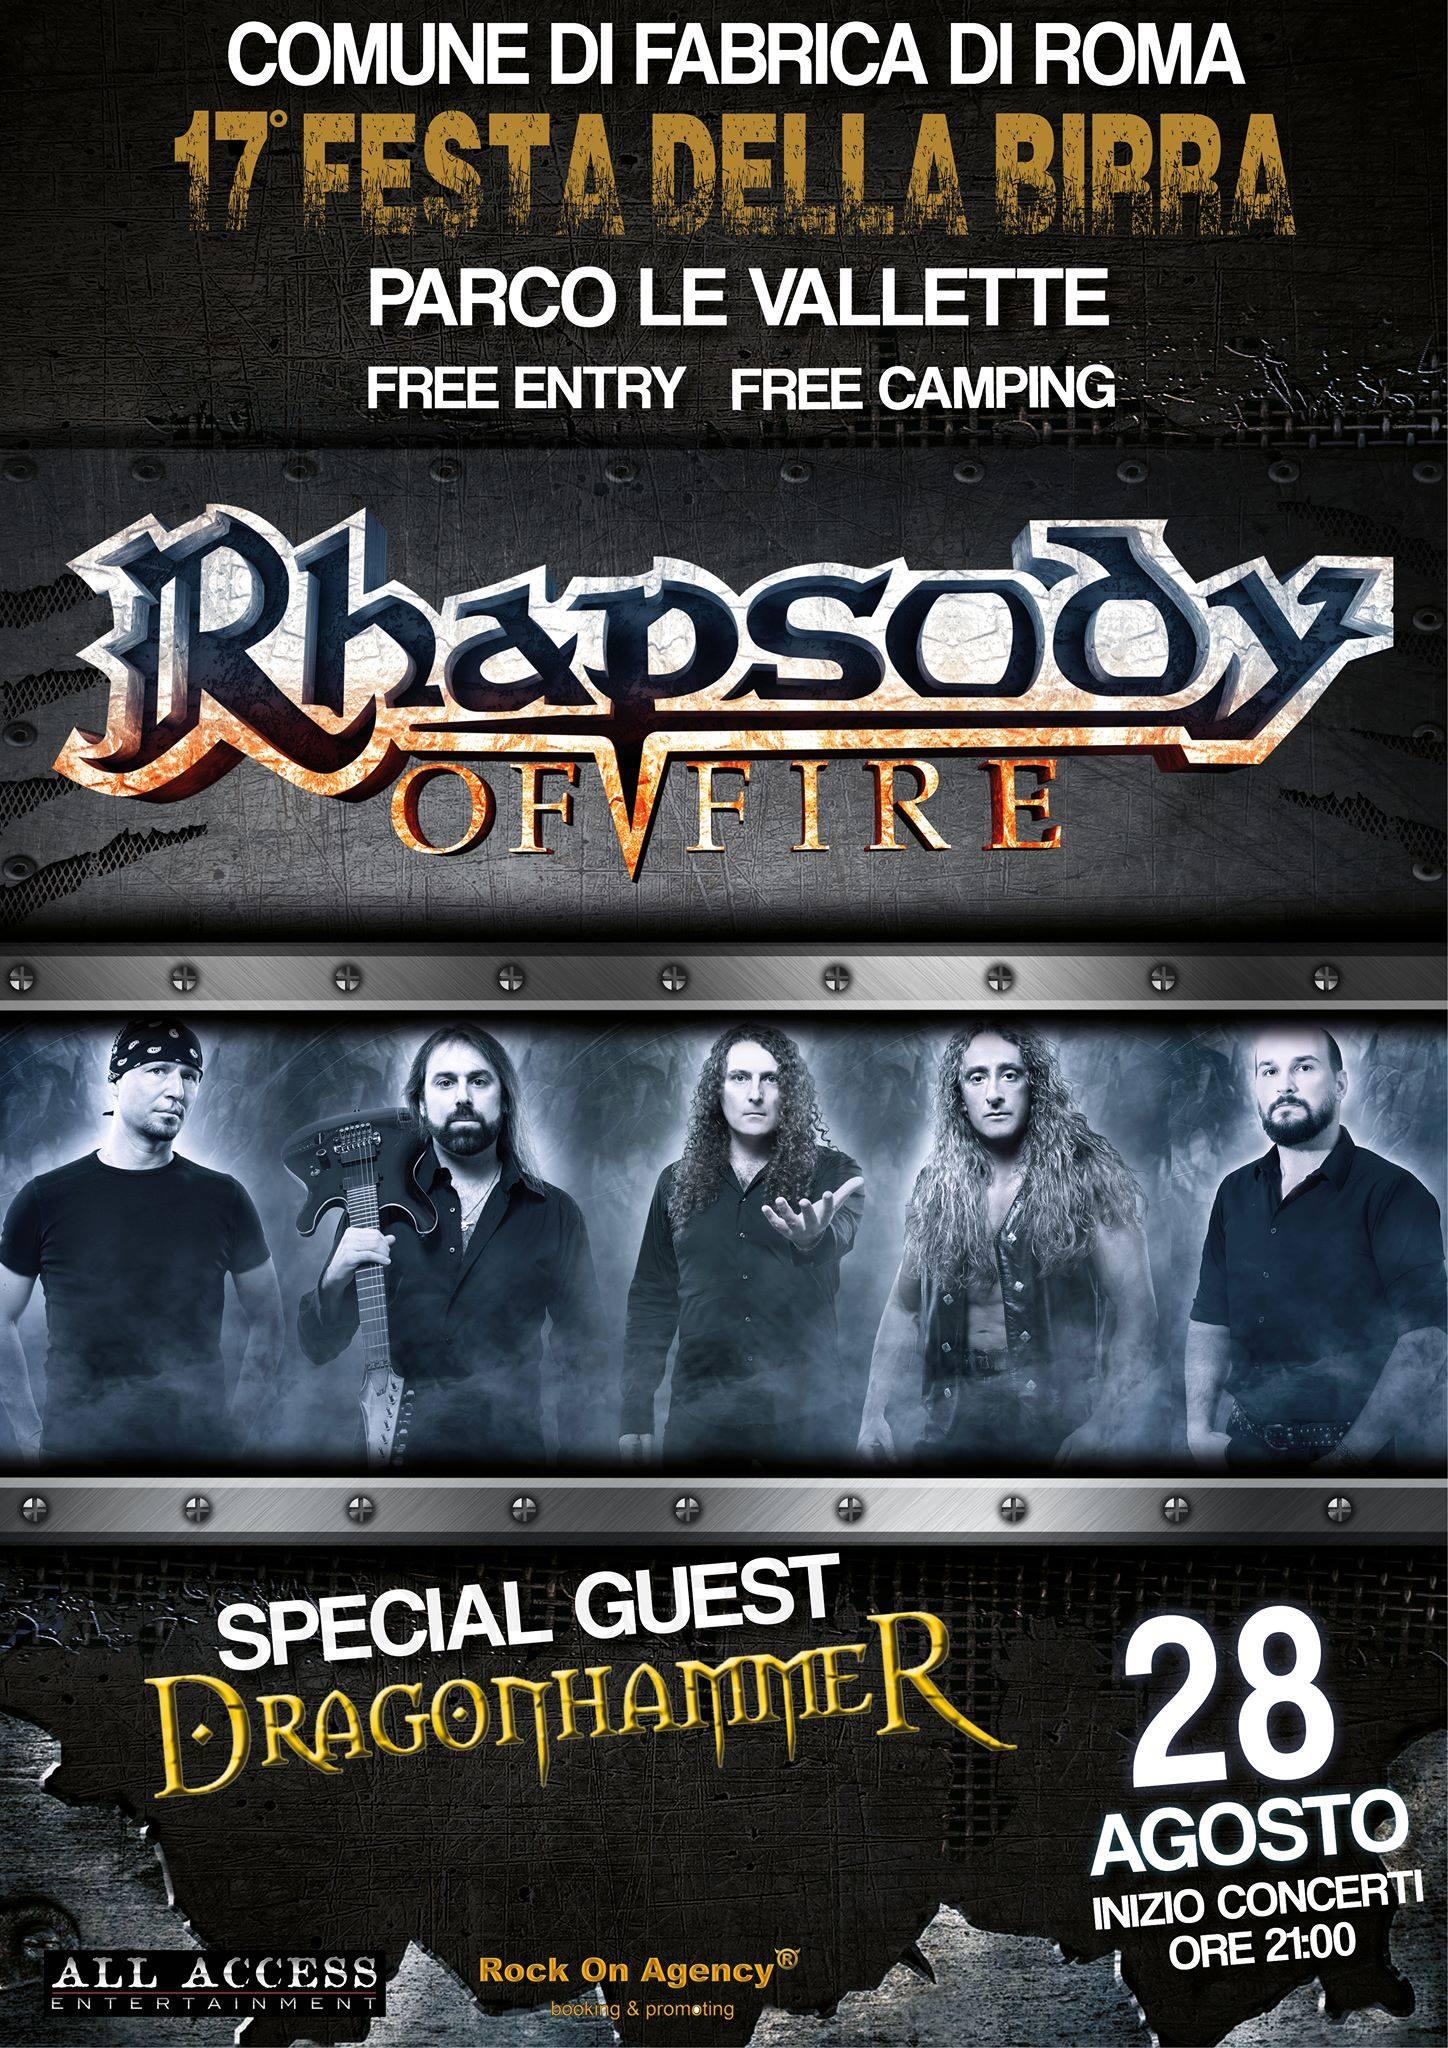 Rhapsody of Fire + Dragonhammer @ Festa della Birra - 17° edizione - 28 08 2015